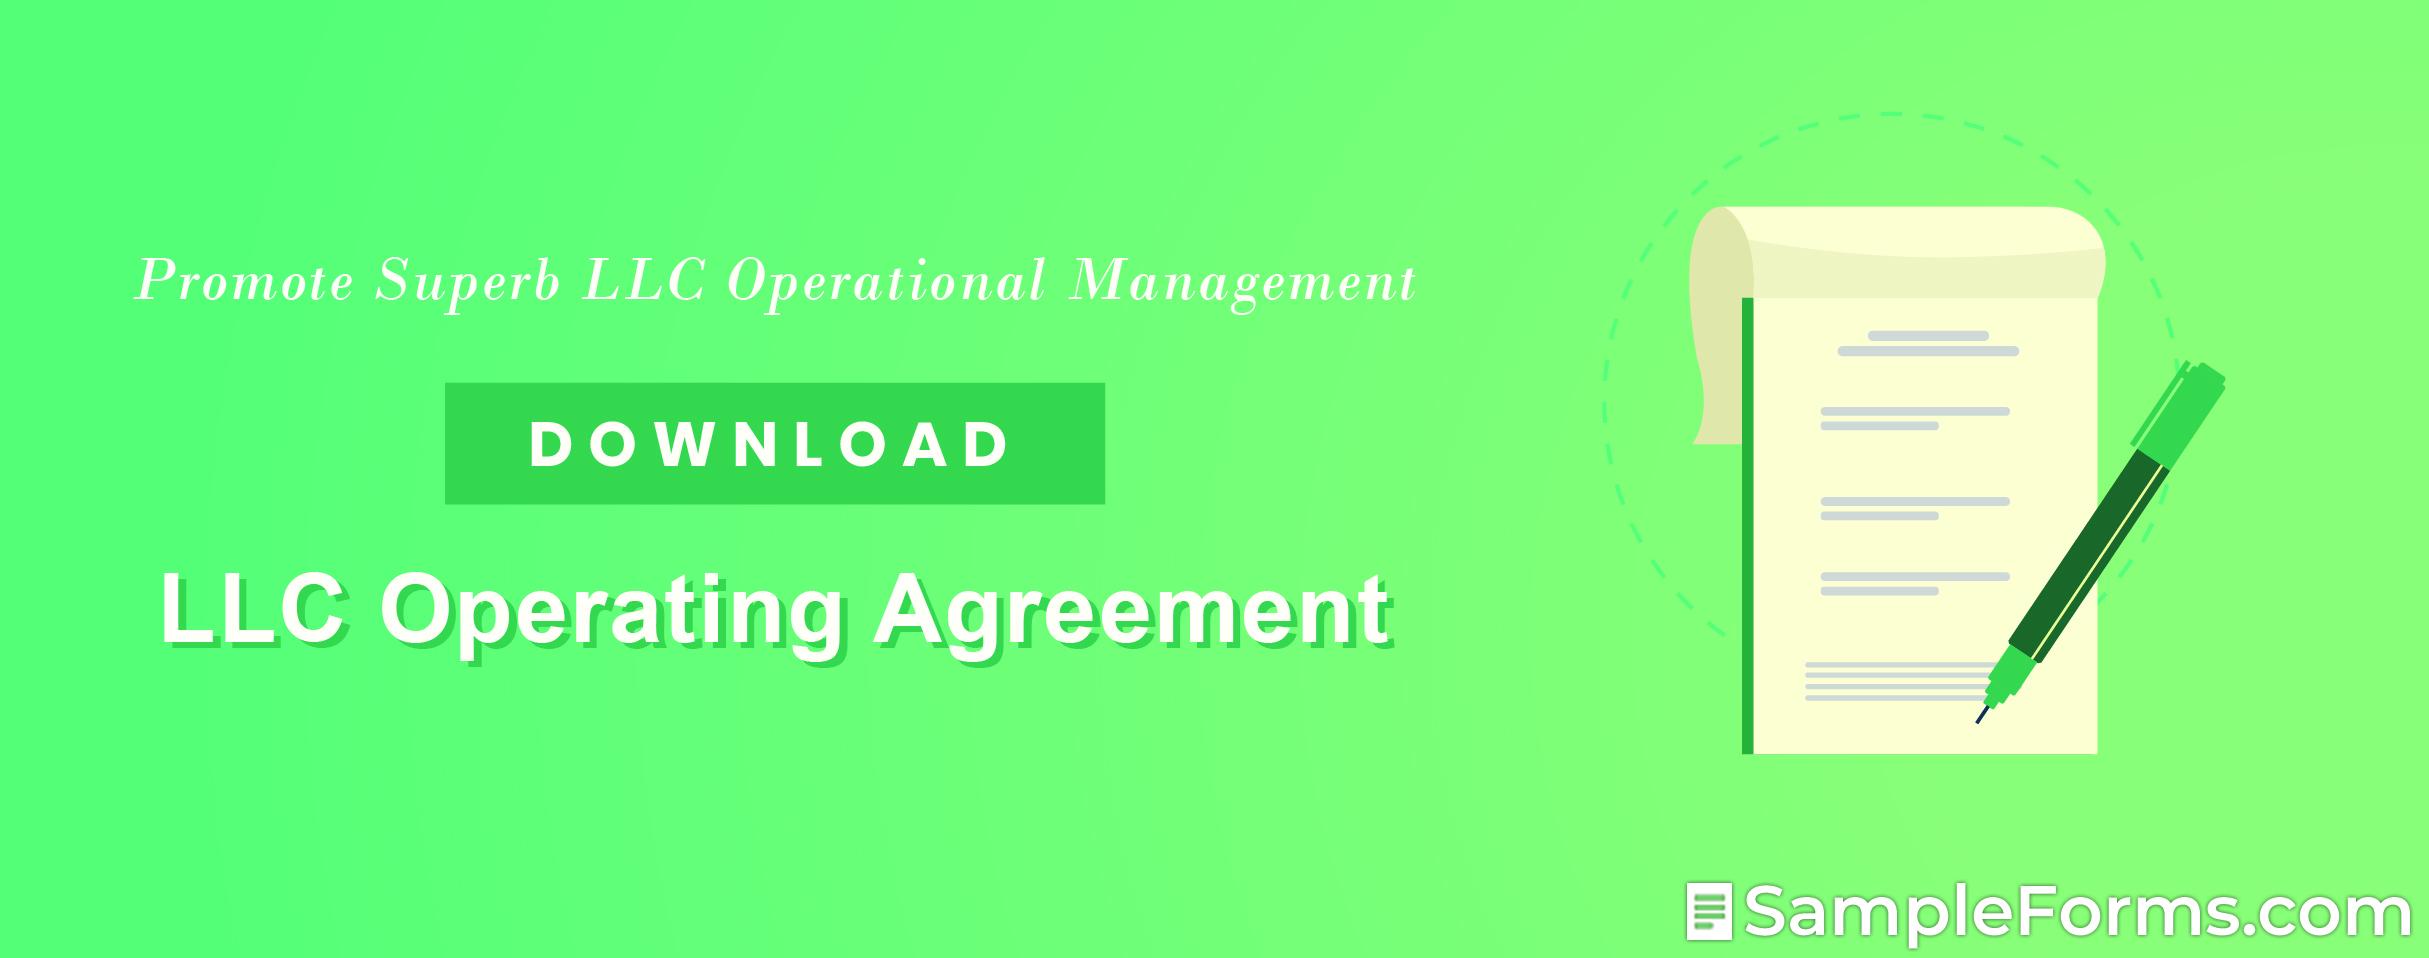 LLC Operating Agreement1